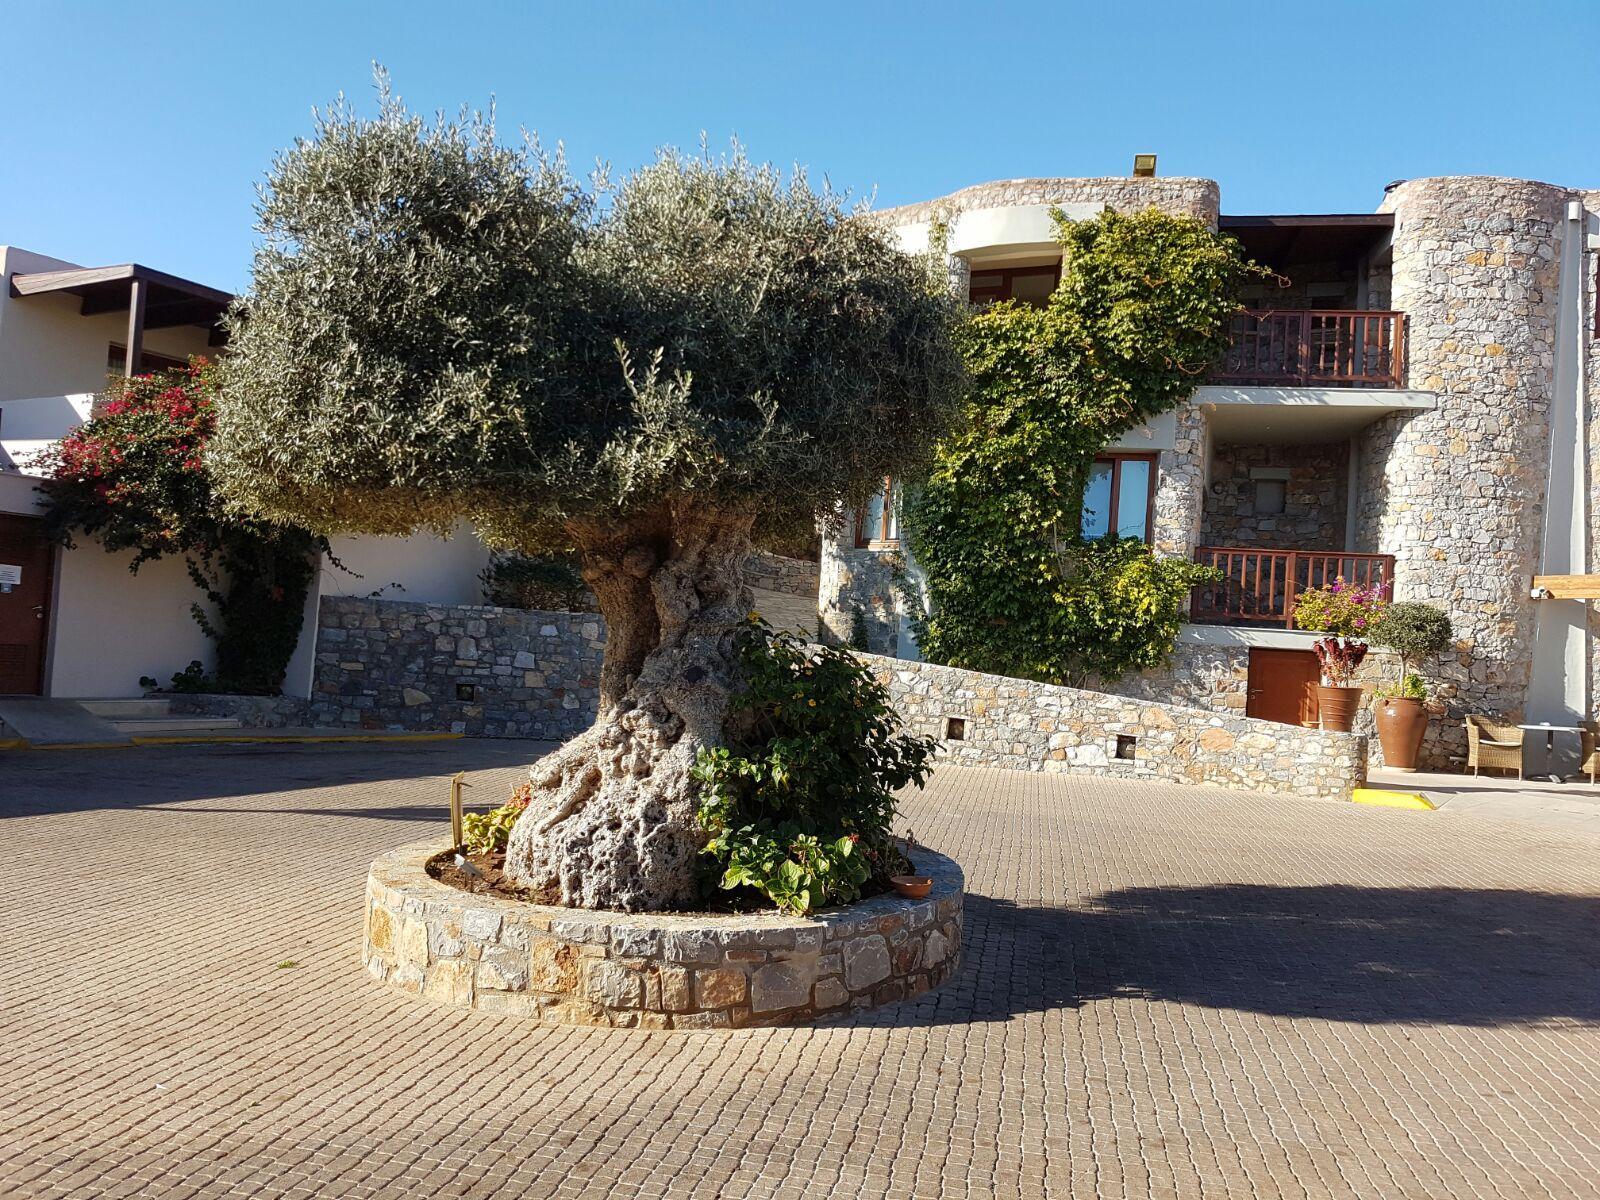 Olivenbaum vor der Receptionseingang.